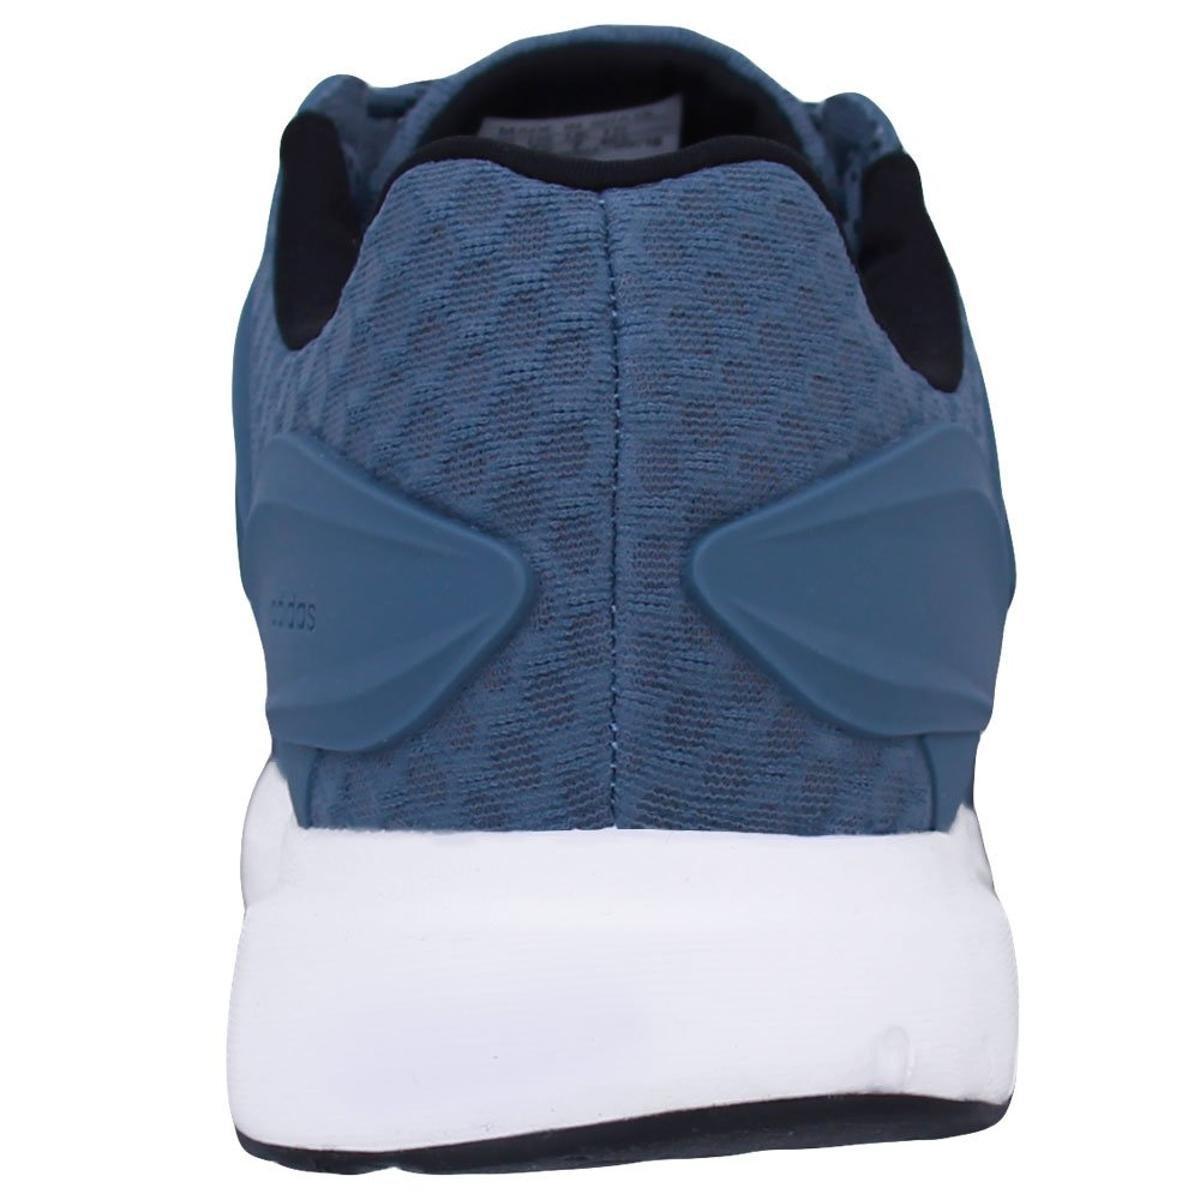 Prata Masculino Tênis Starlux e Adidas Adidas Tênis Preto XXzST